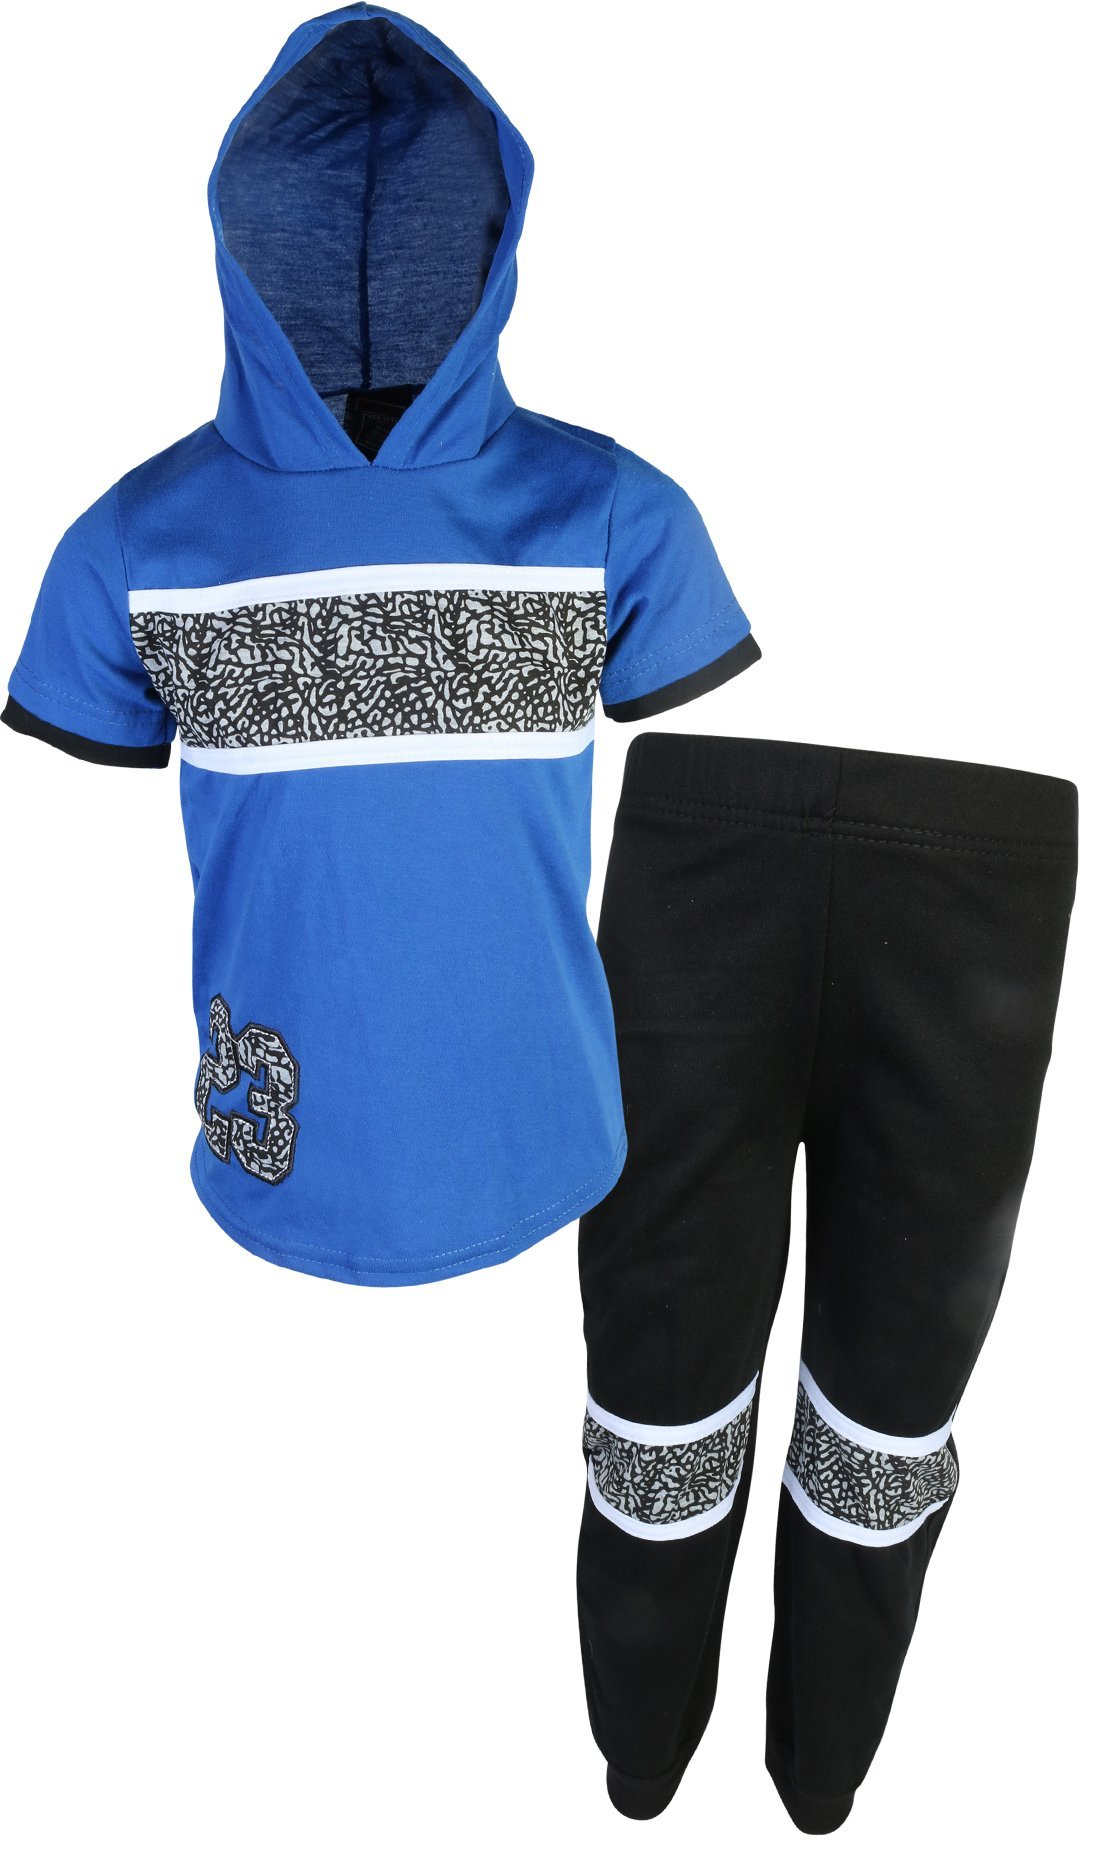 Quad Seven Boys 2 Piece Jogger Set with Short Sleeve Top, Blue/Black, Size 4'